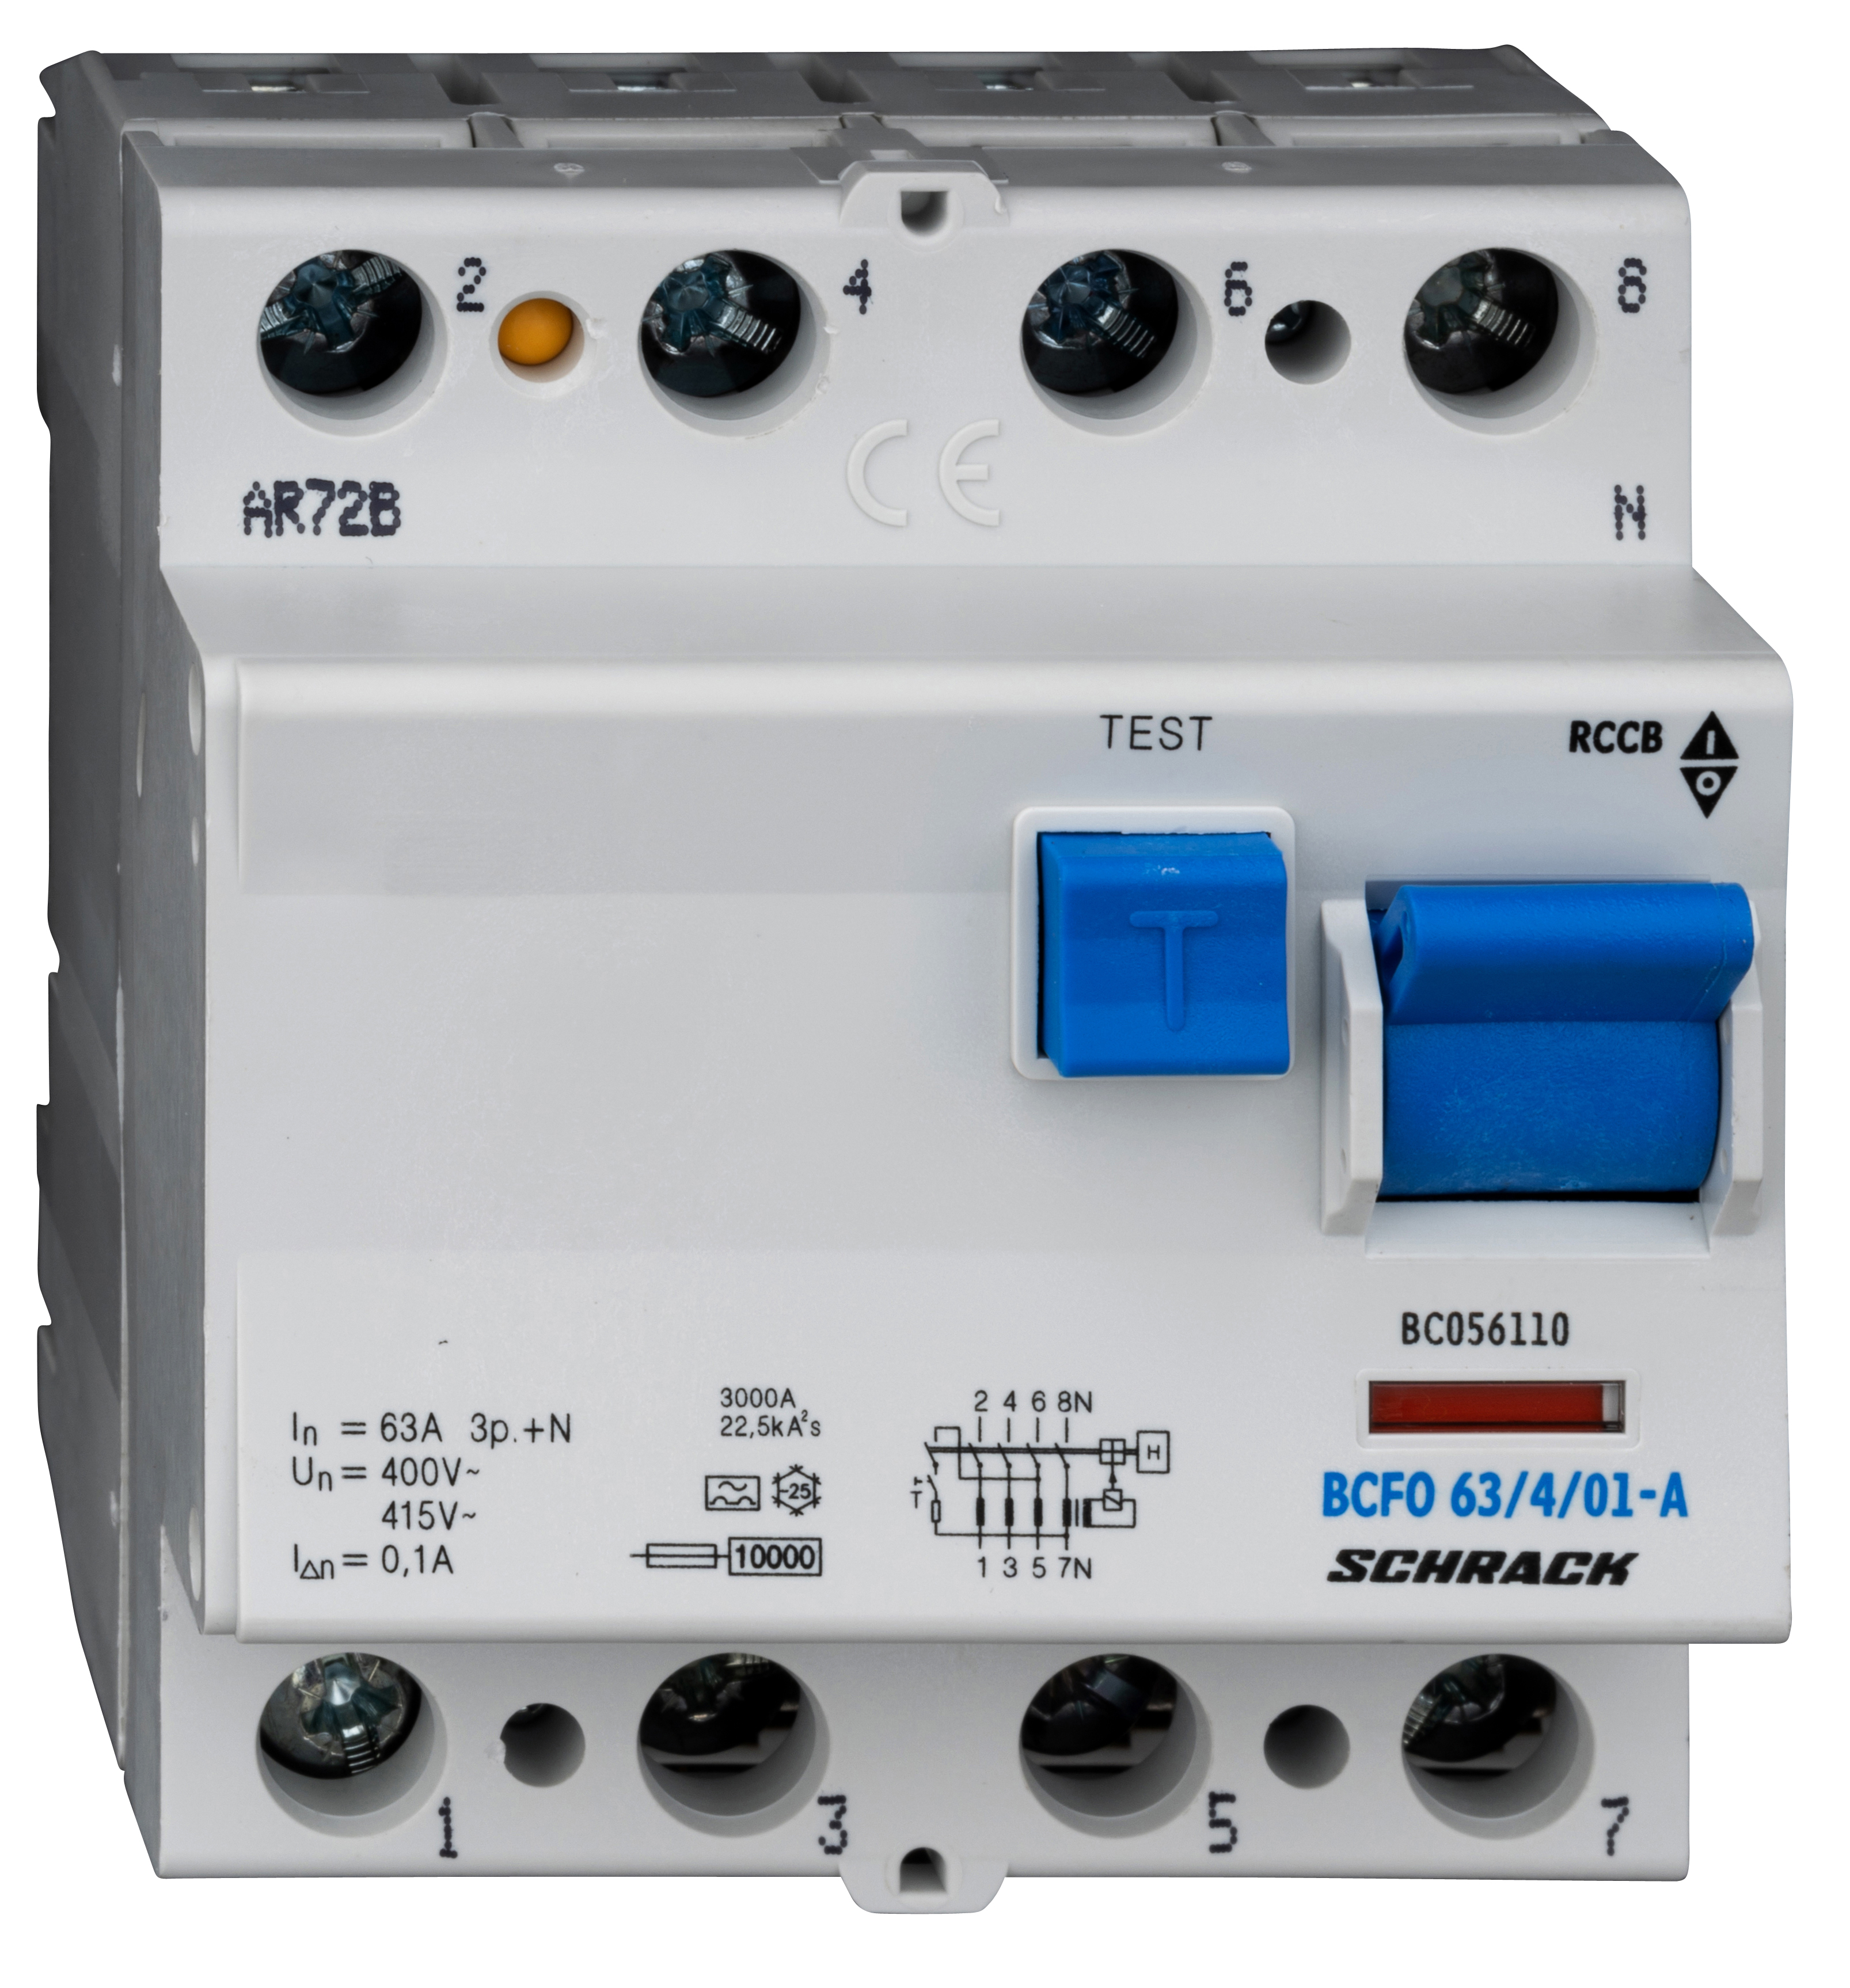 1 Stk FI-Schalter, 63A, 4-polig, 100mA, Typ A (Puls) BC056110--